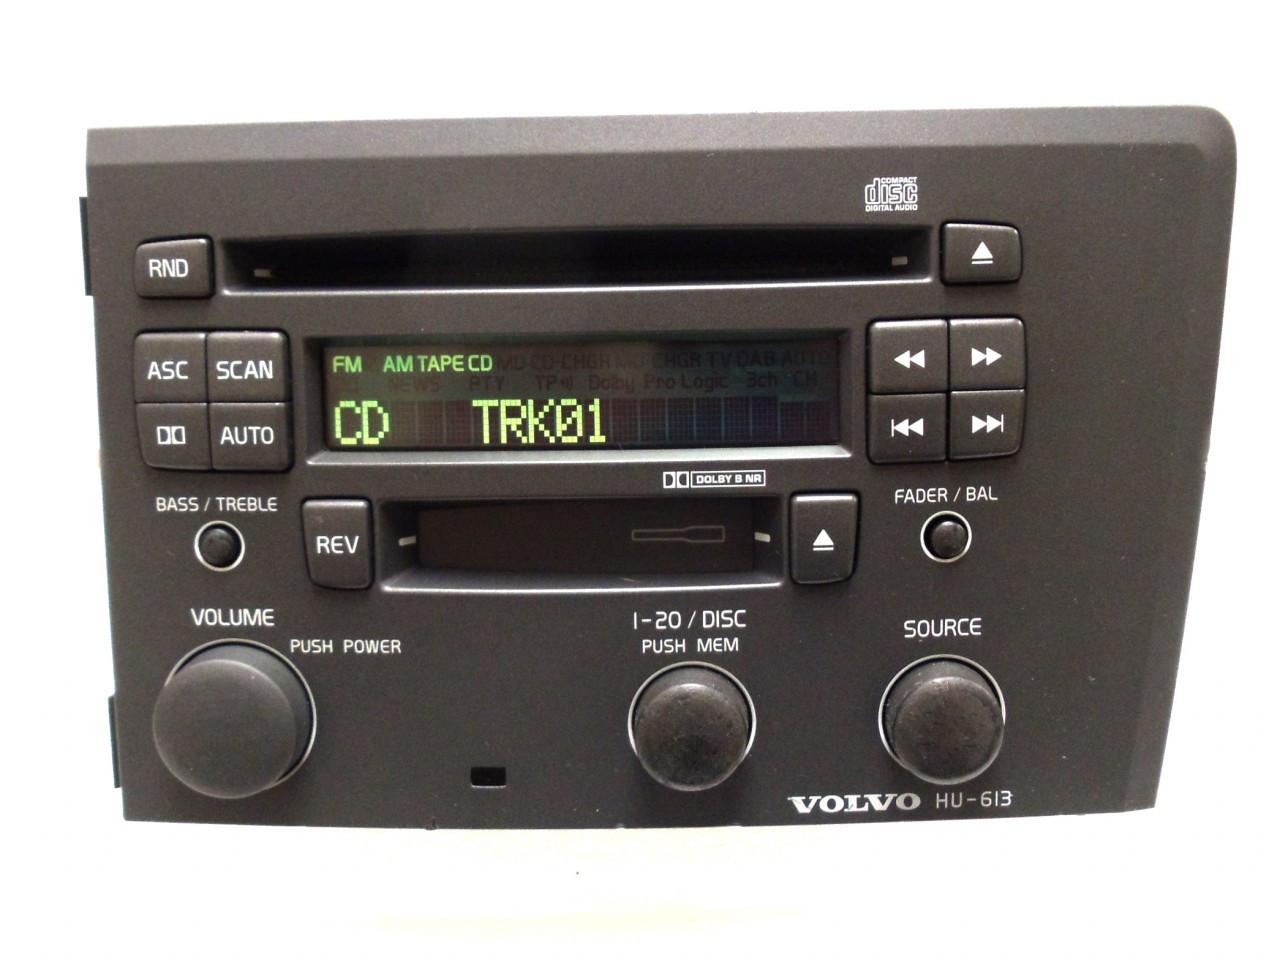 Volvo 850 Radio Wiring Harness Diagram On Volvo 850 Car Stereo Wiring